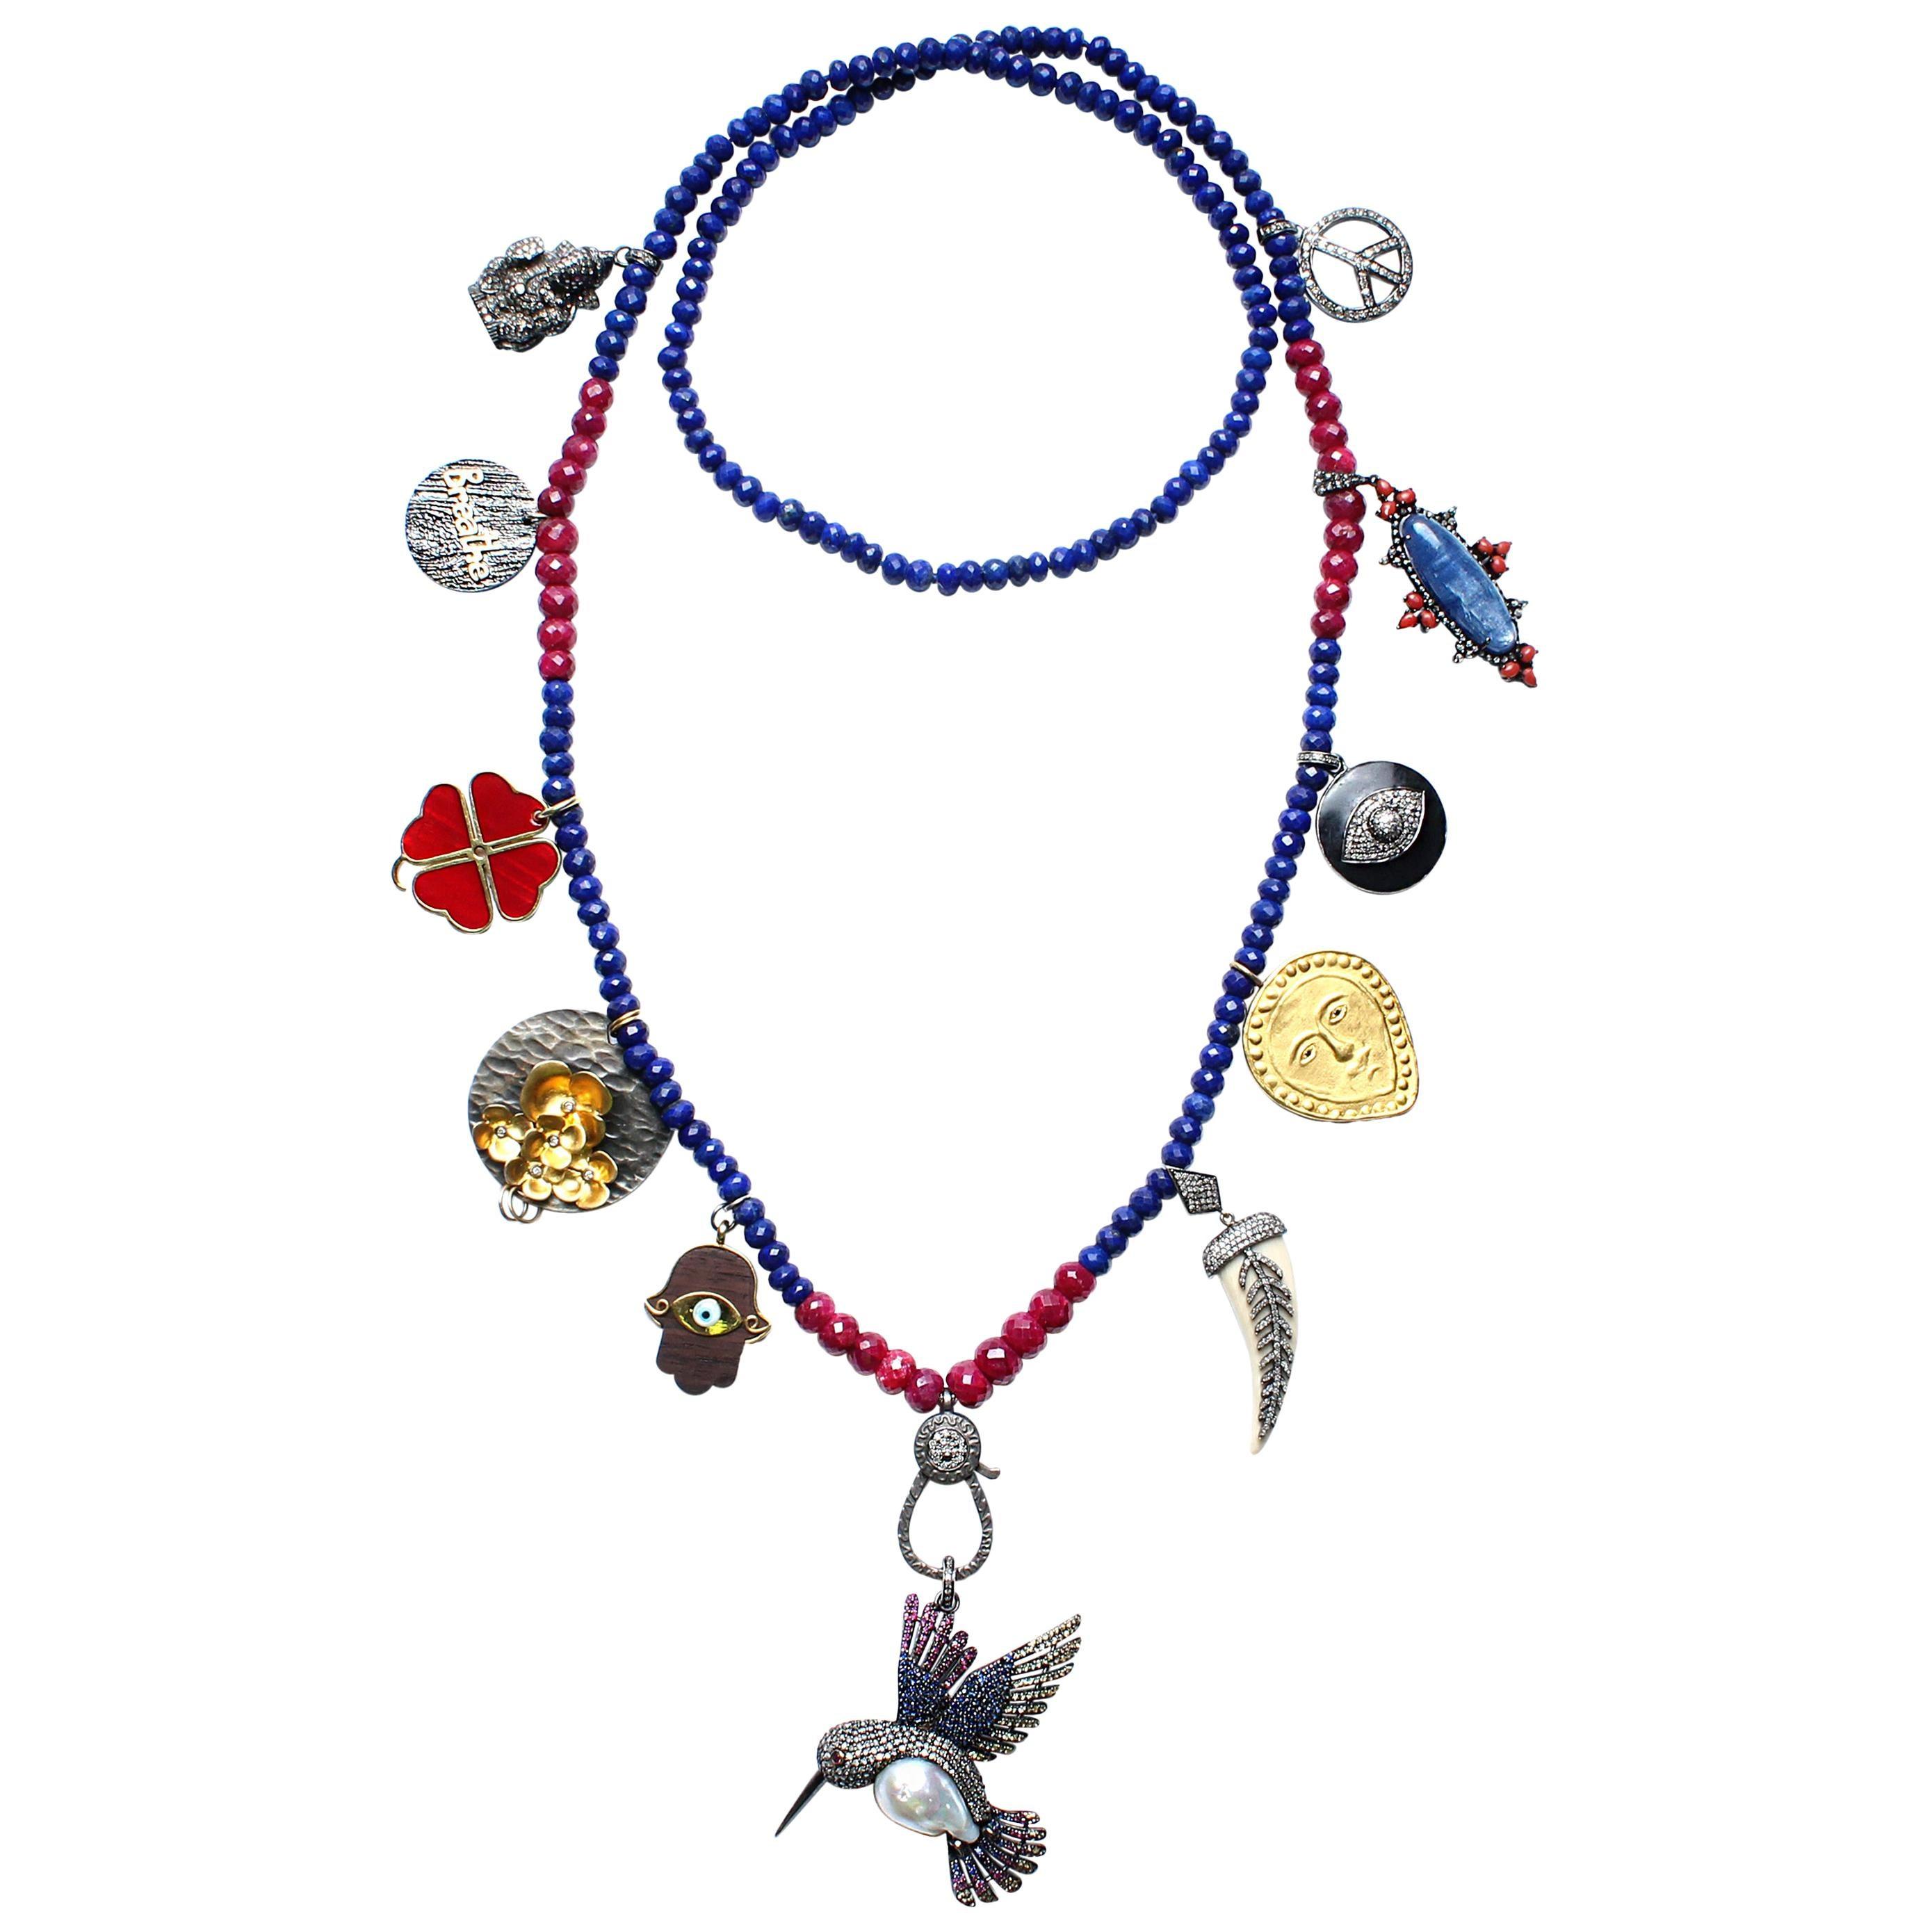 Clarissa Bronfman Signature Birthday Necklace with Hummingbird Pendant